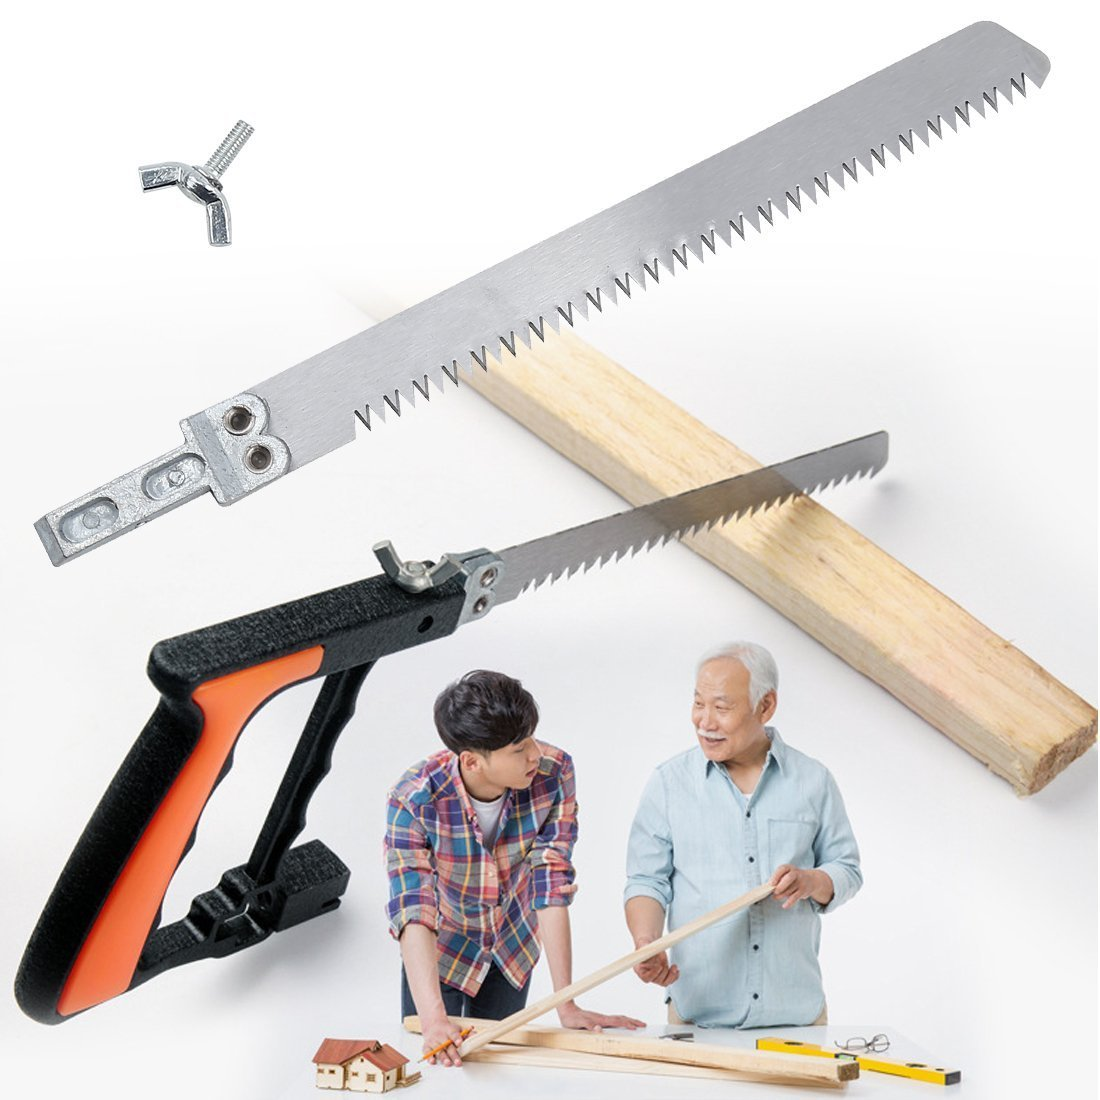 Handsaws Set, Four Fold Ruler, Multifunction Bow Saw +Angle Measuring Ruler for Engineer Handymen Builders Craftsmen by SILIVN by SILIVN (Image #6)